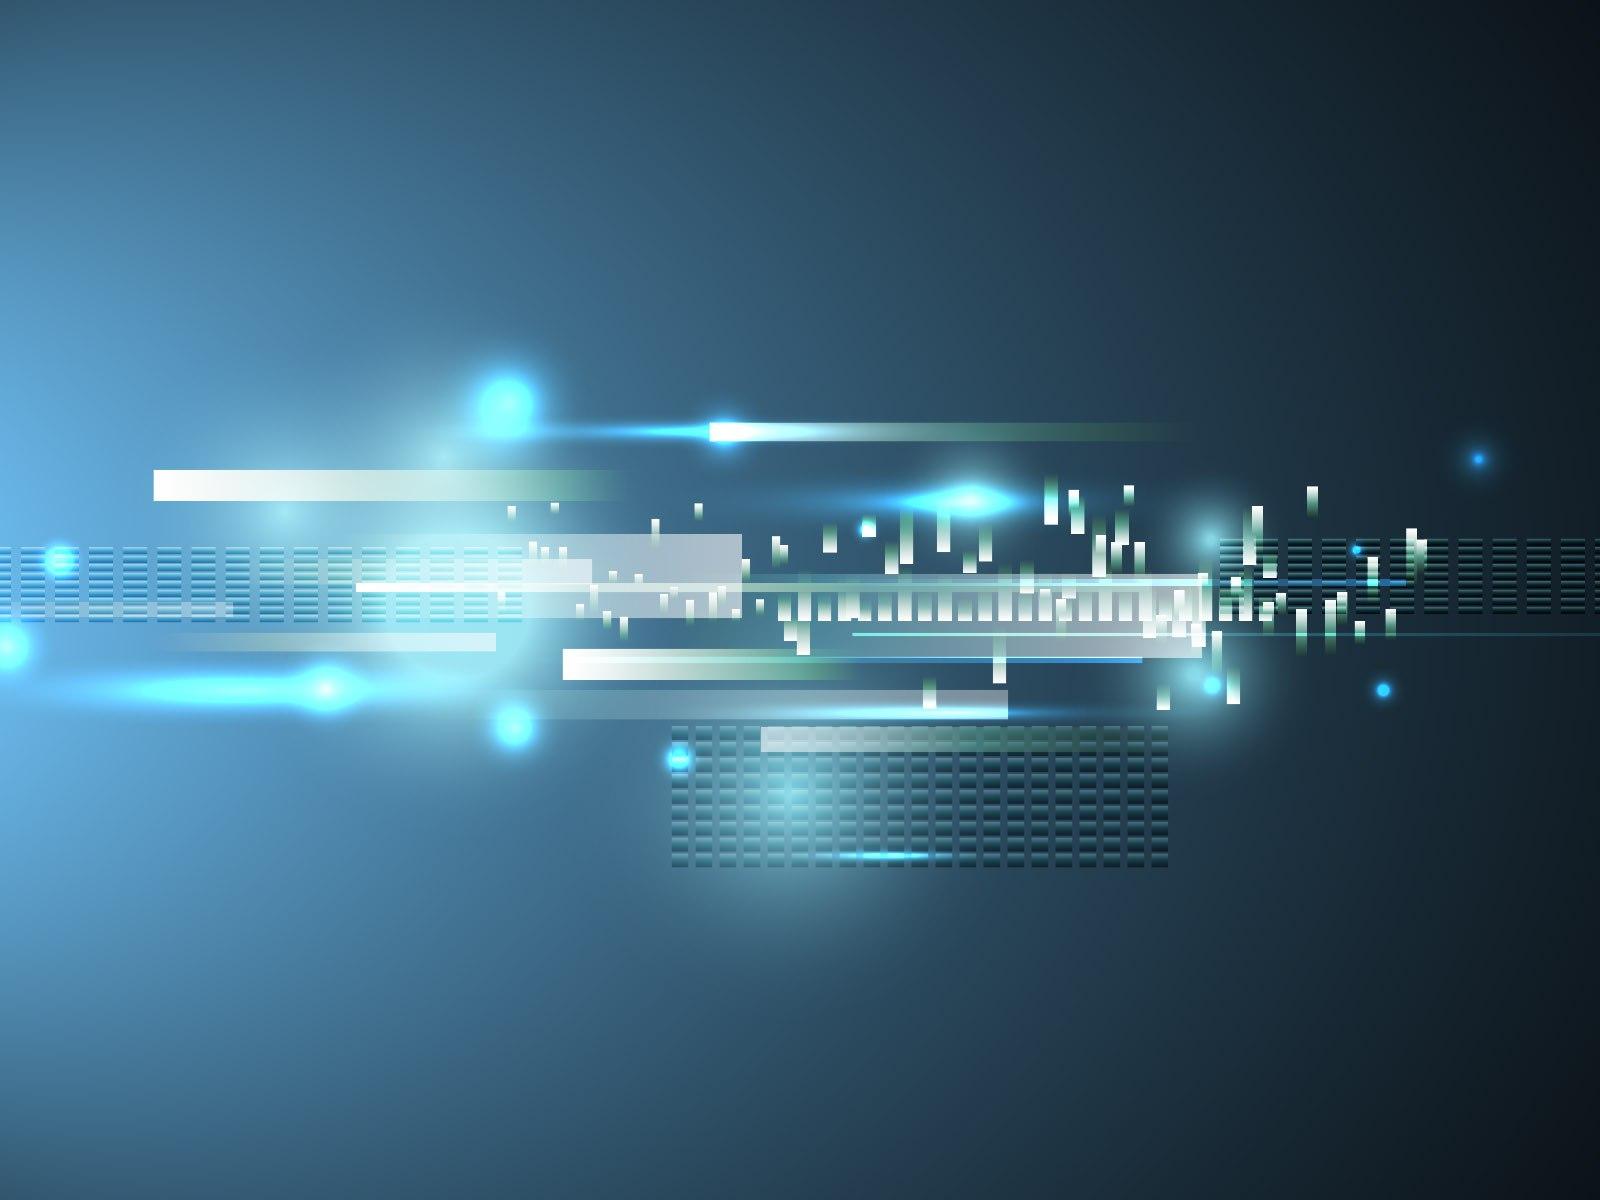 Telecom Industry Tech Powerpoint Templates  Industrial For High Tech Powerpoint Template